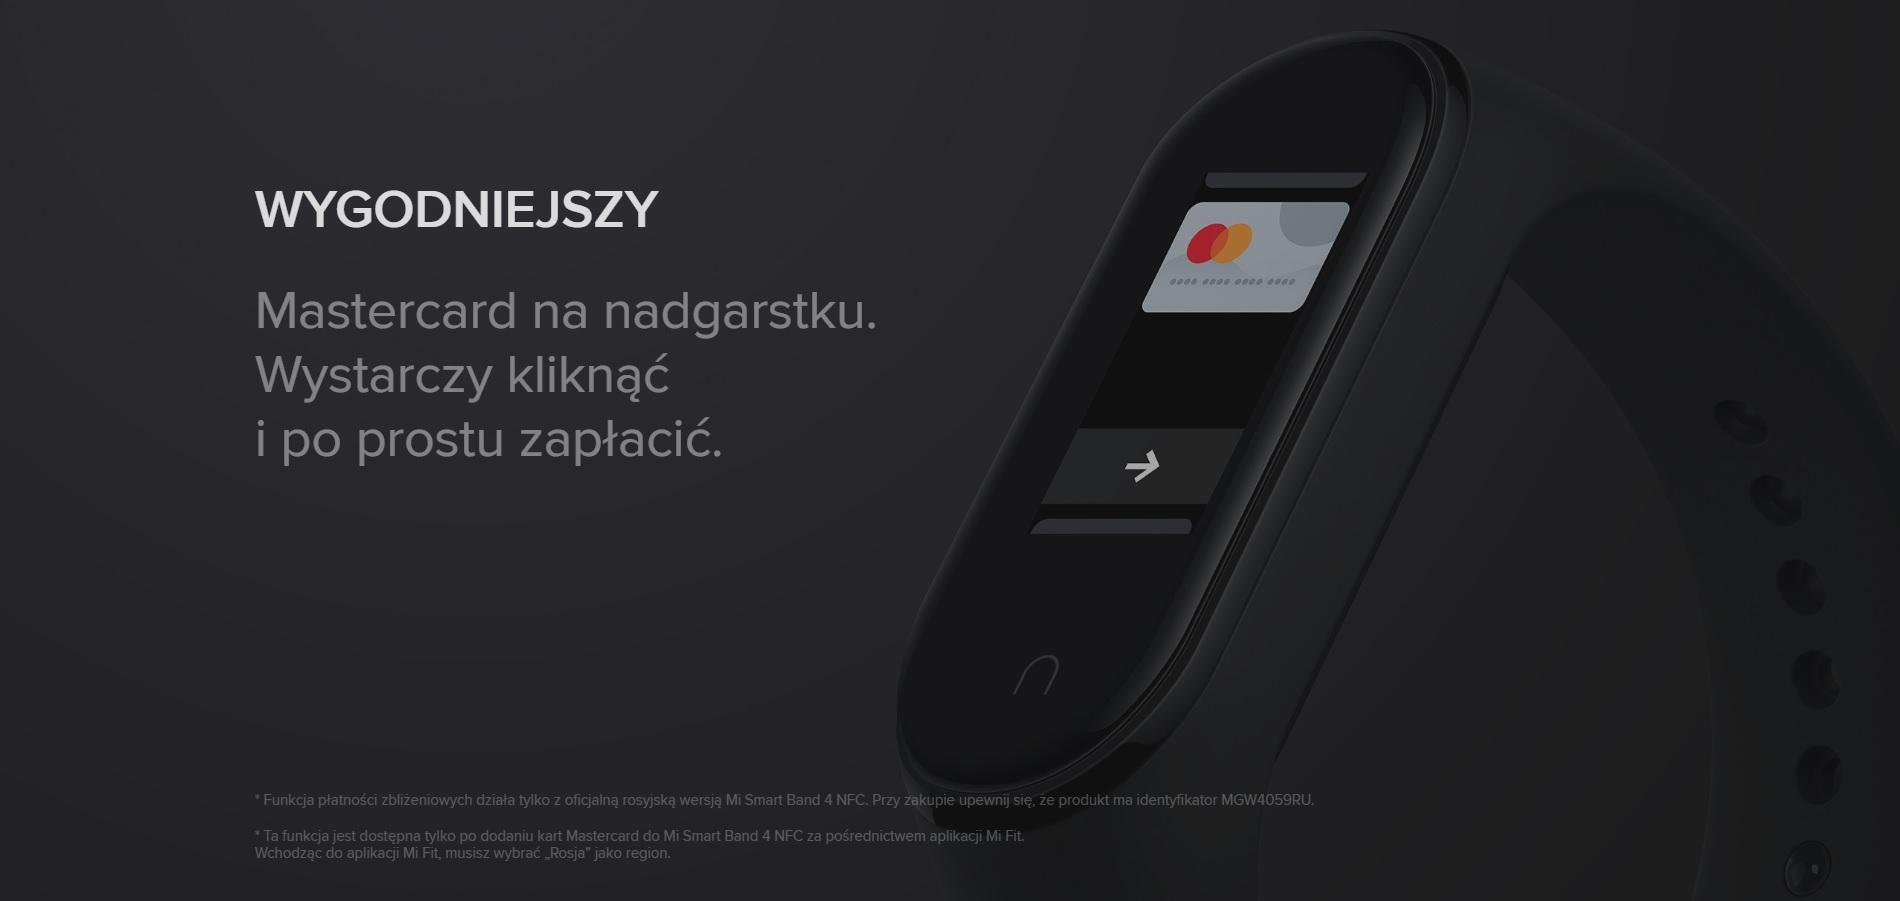 Xiaomi Mi Band 4 NFC MGW4059RU